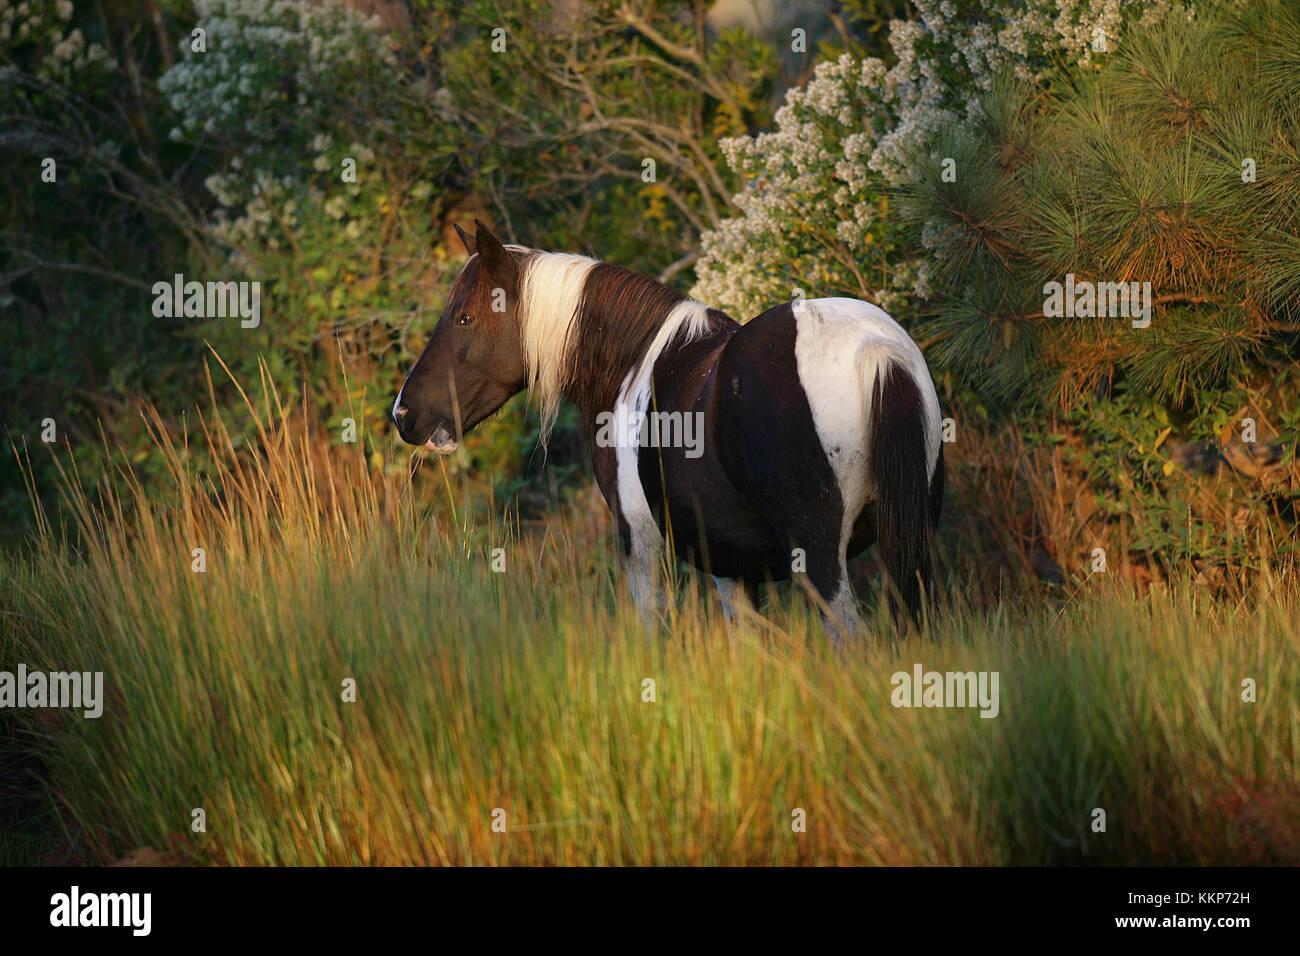 Chincoteague Pony - Stock Image